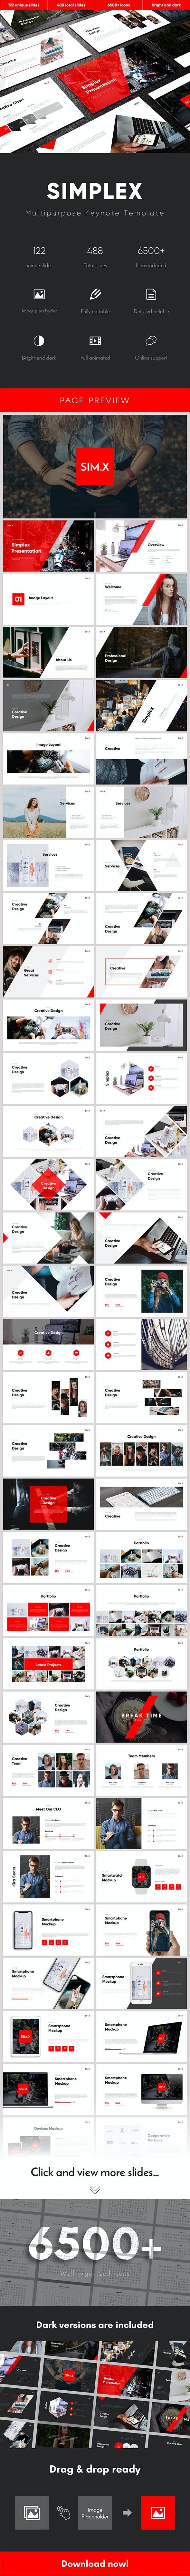 Simplex Multipurpose Keynote Template - Business Keynote Templates